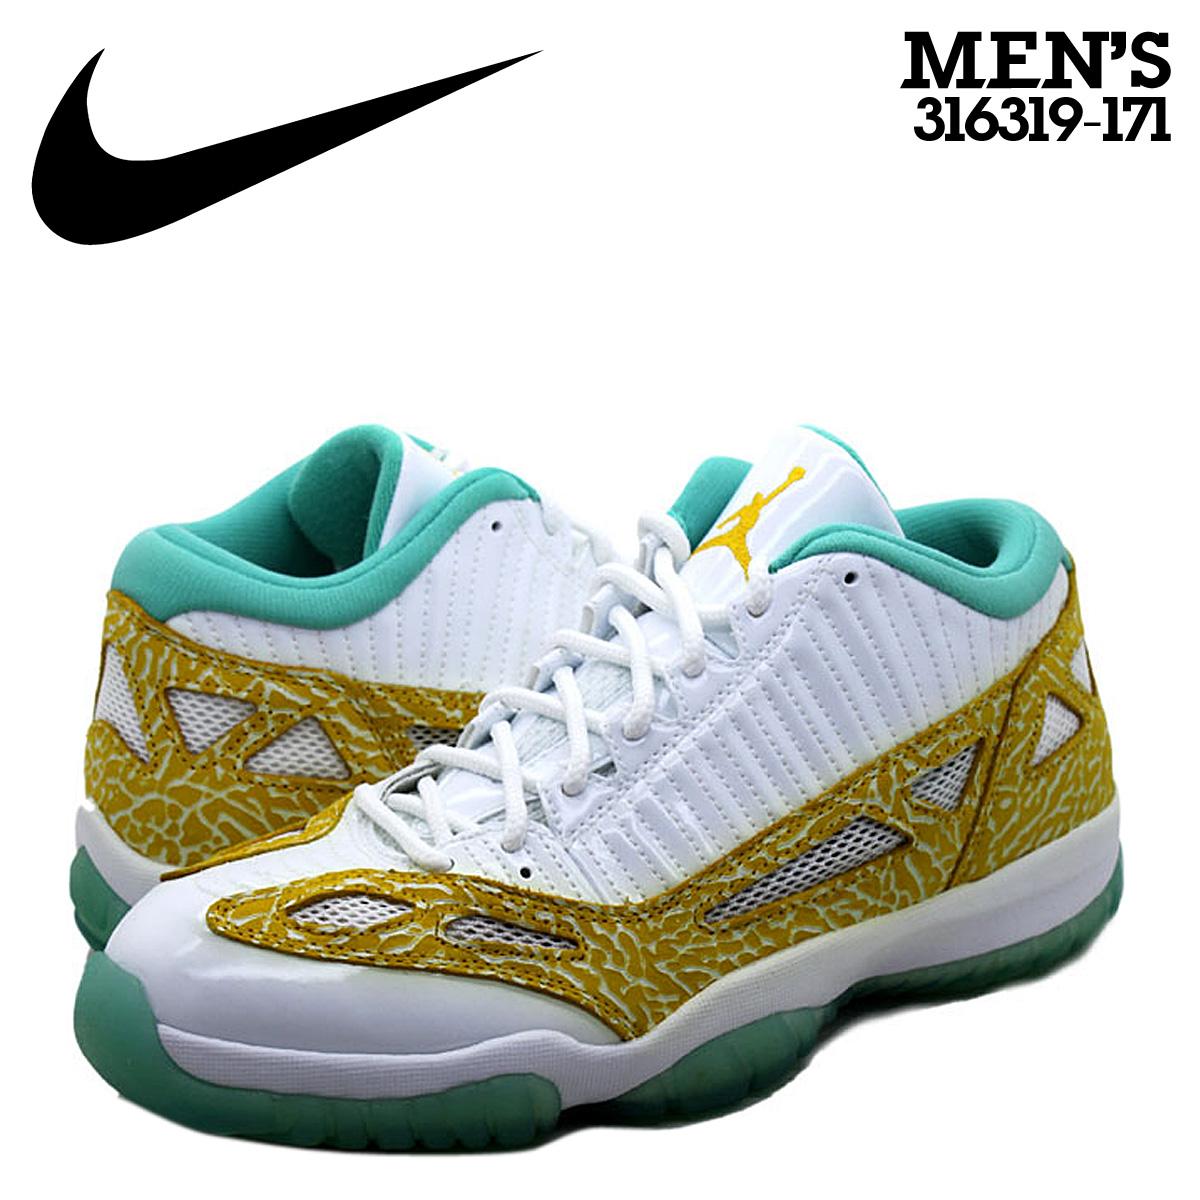 acf89fb16f6bbf ... black nike shoes 1d319 566f3  where can i buy nike nike air jordan  sneakers air jordan 11 retro low lswhite varsity